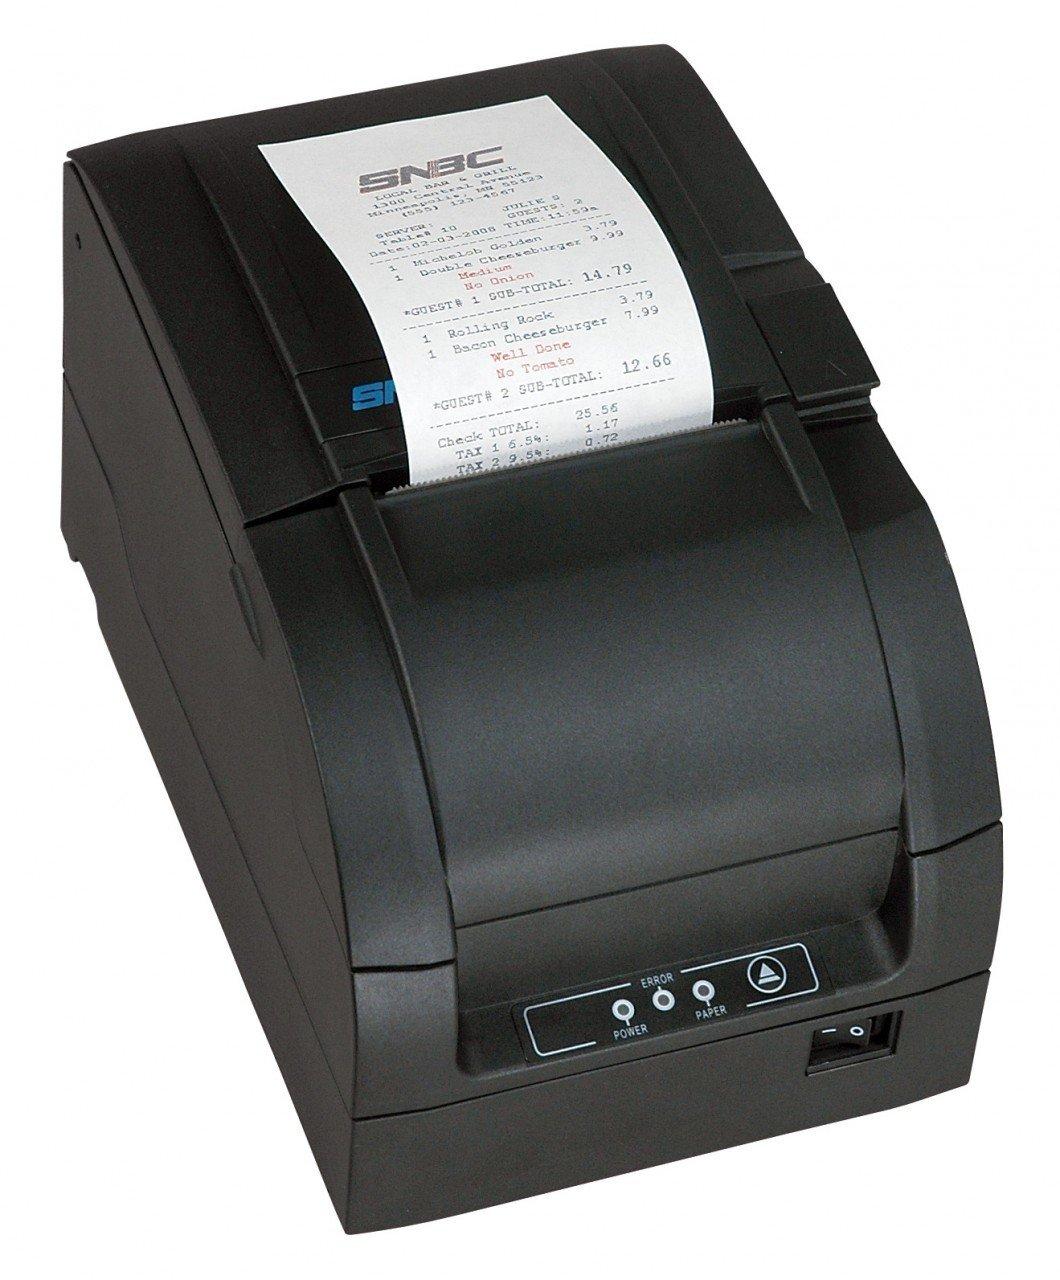 SNBC BTP-M300 Impact Ethernet POS Impresora de Recibos ...